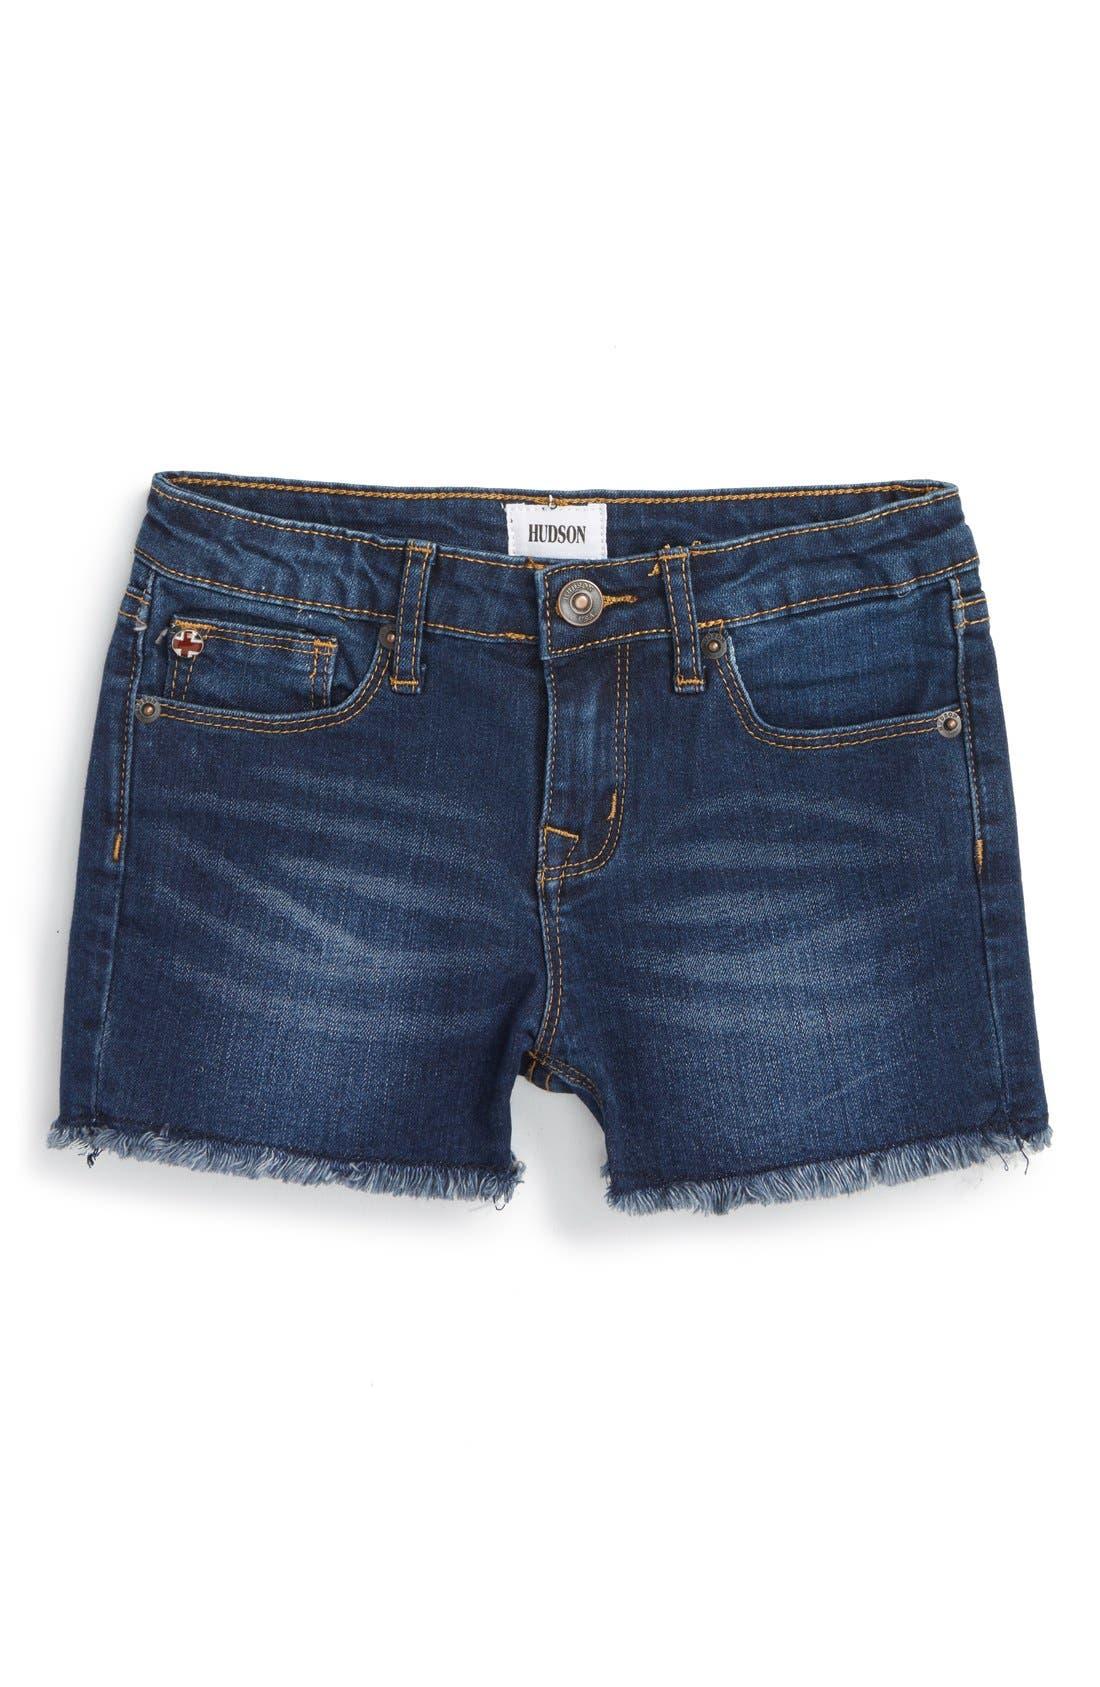 Alternate Image 1 Selected - Hudson Kids Cutoff Denim Shorts (Toddler Girls & Little Girls)